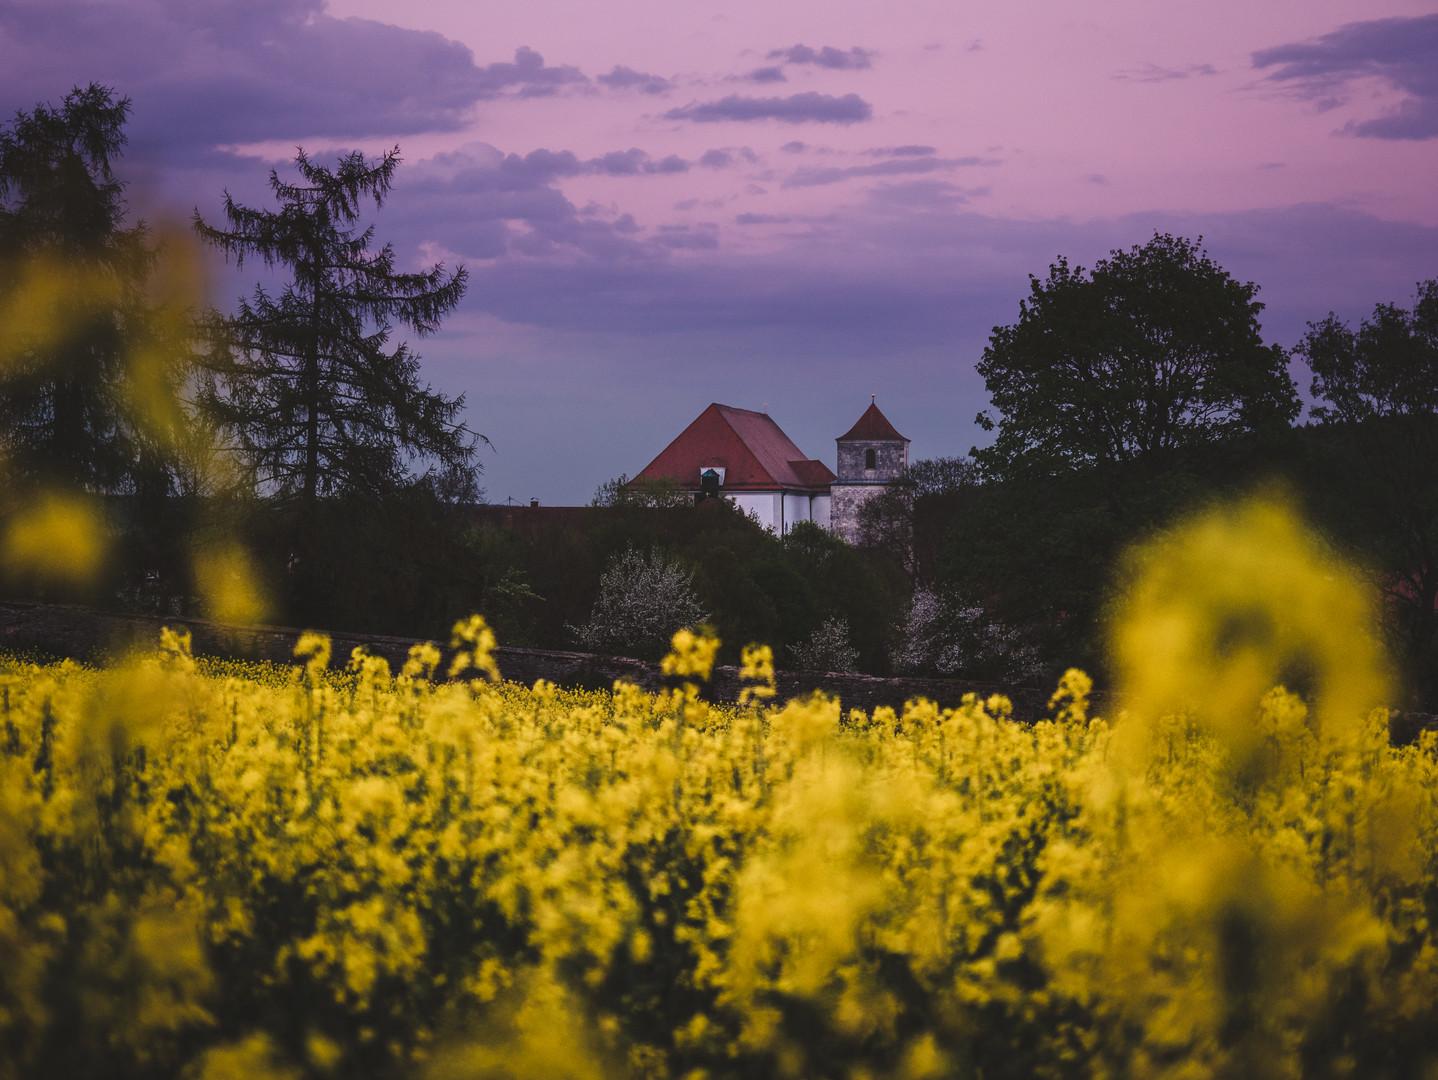 Through the fields at dusk